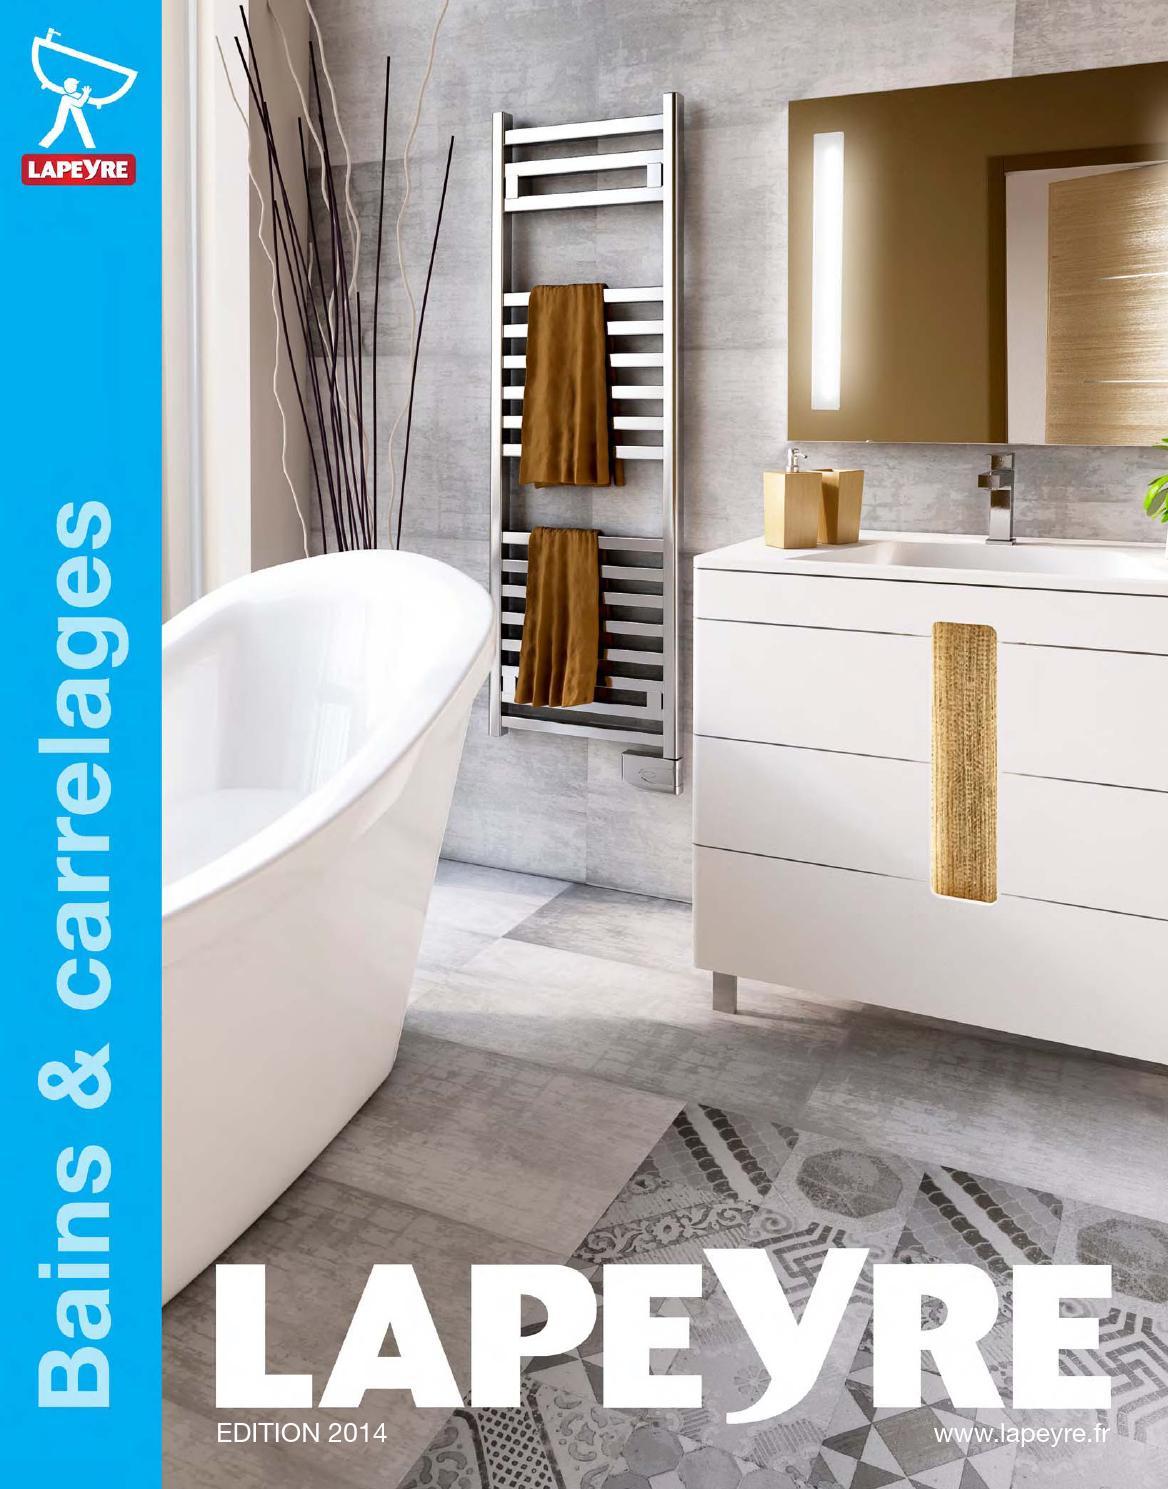 Catalogue Lapeyre Bains Amp Carrelages 2014 By Joe Monroe